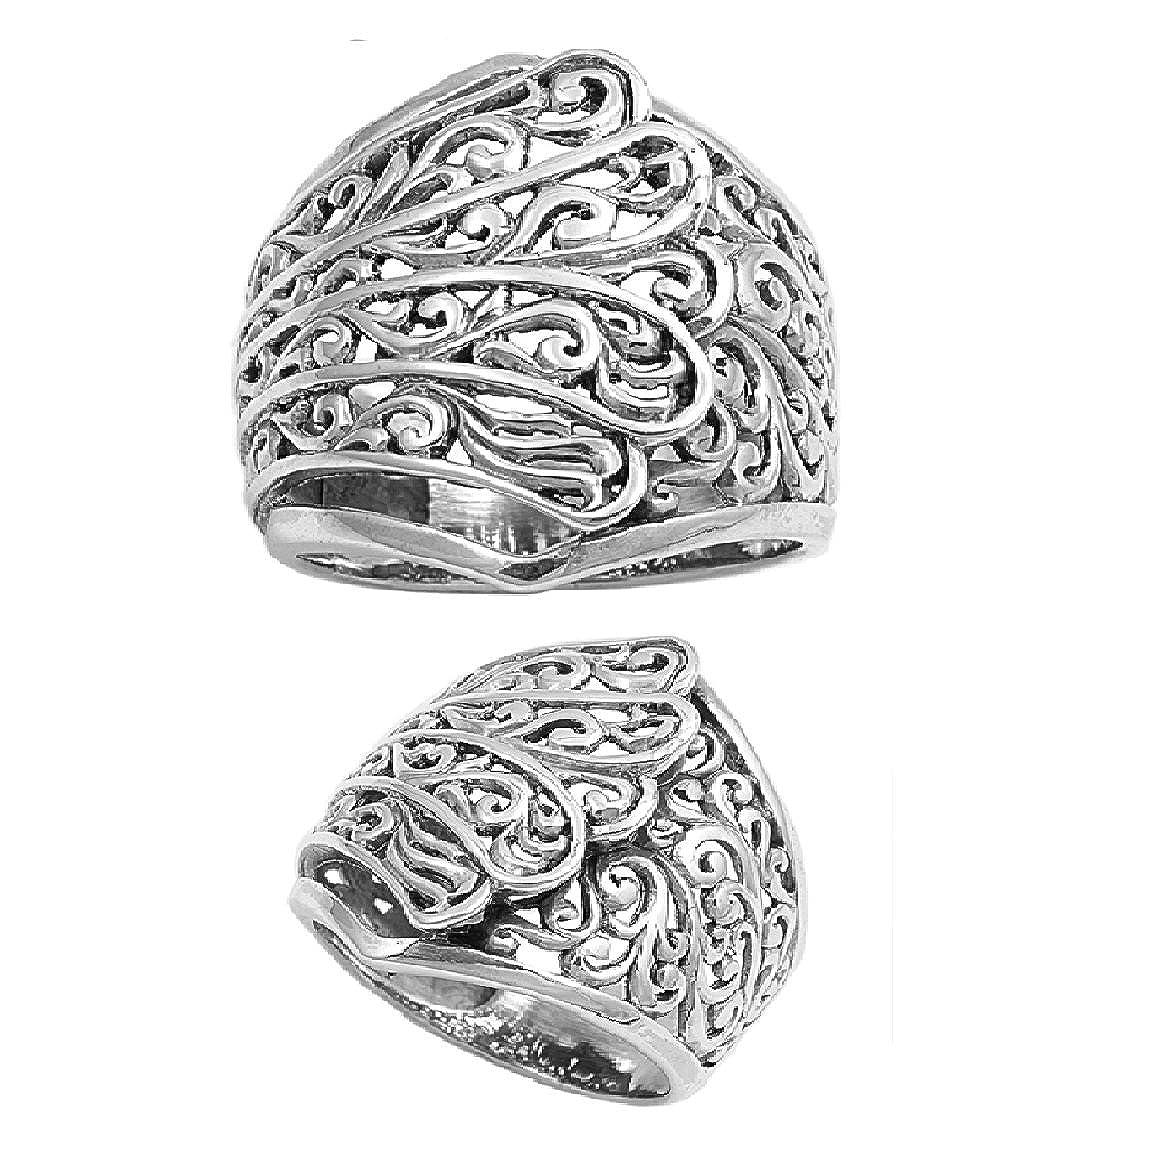 Princess Kylie 925 Sterling Silver Victorian Designer Filigree Art Ring